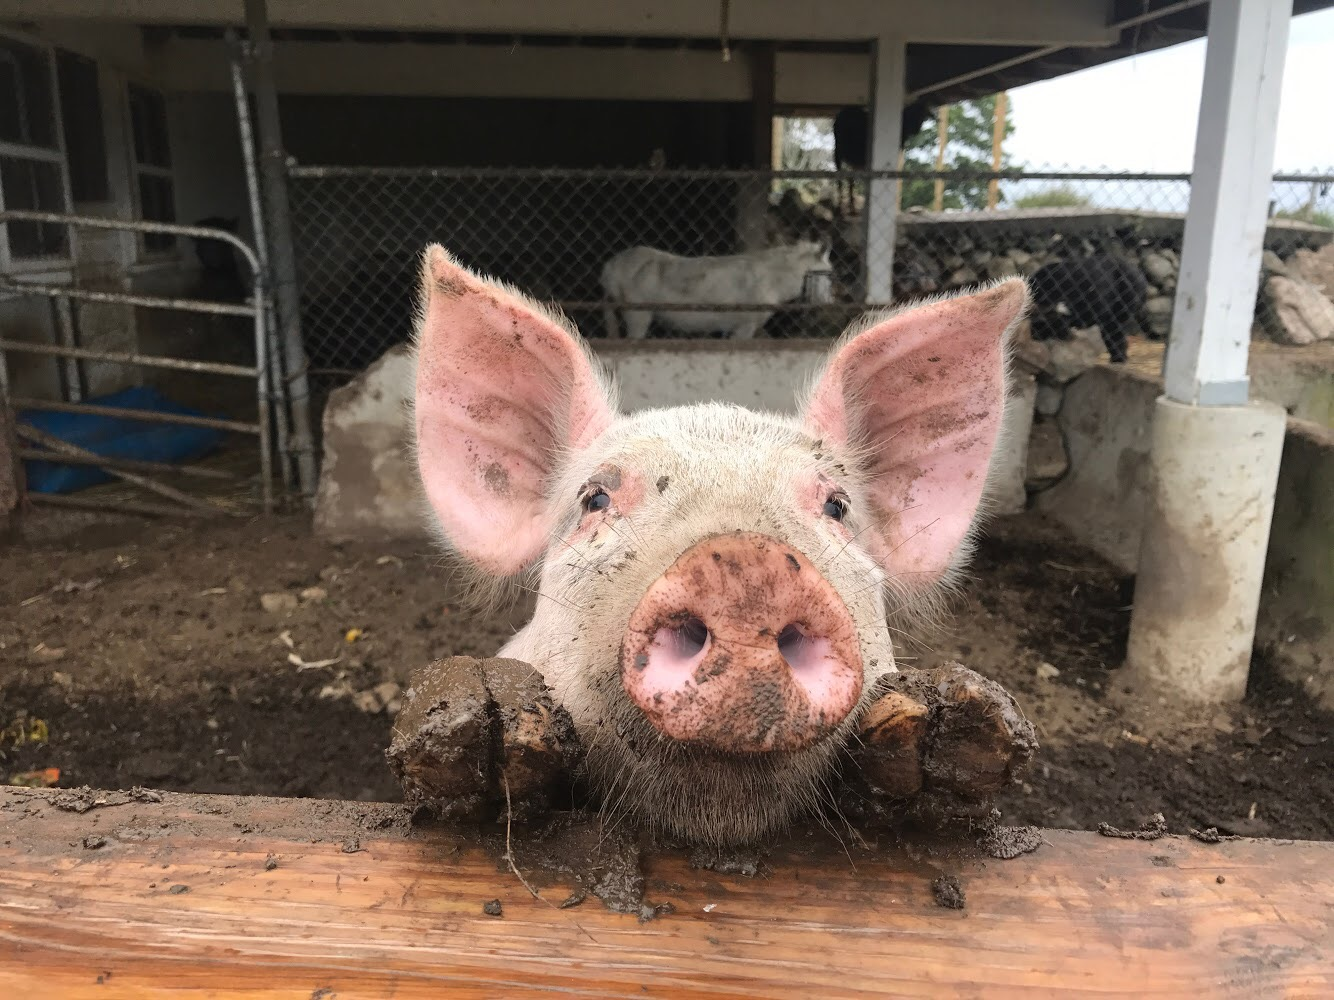 Pig | Brooksby Farm | Peabody, MA